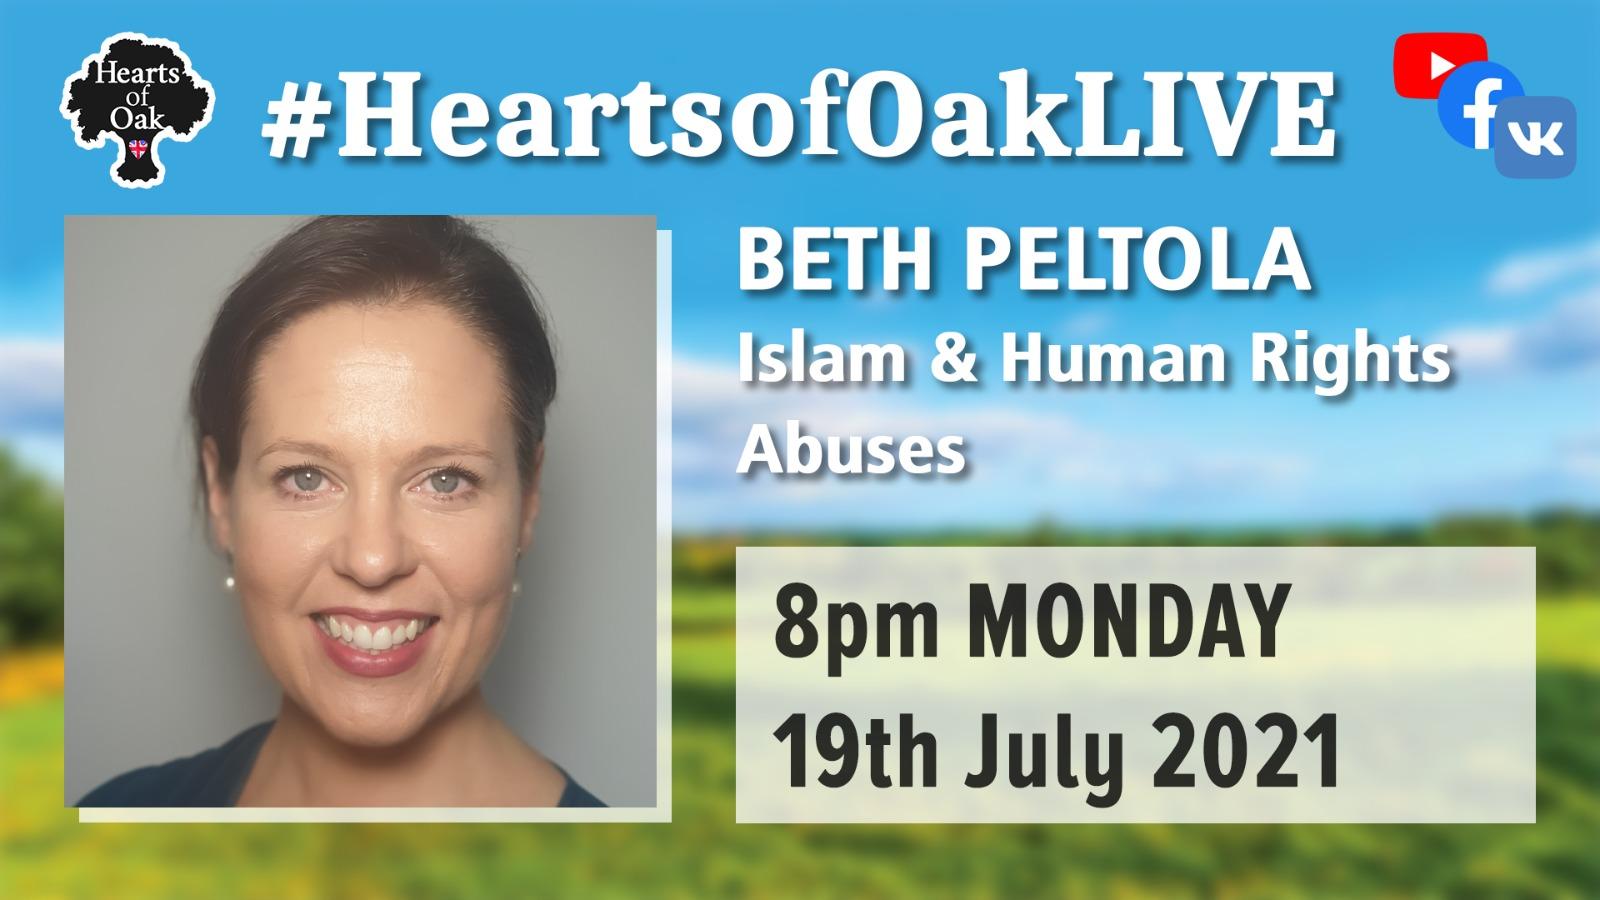 Beth Peltola: Islam & Human Rights Abuses